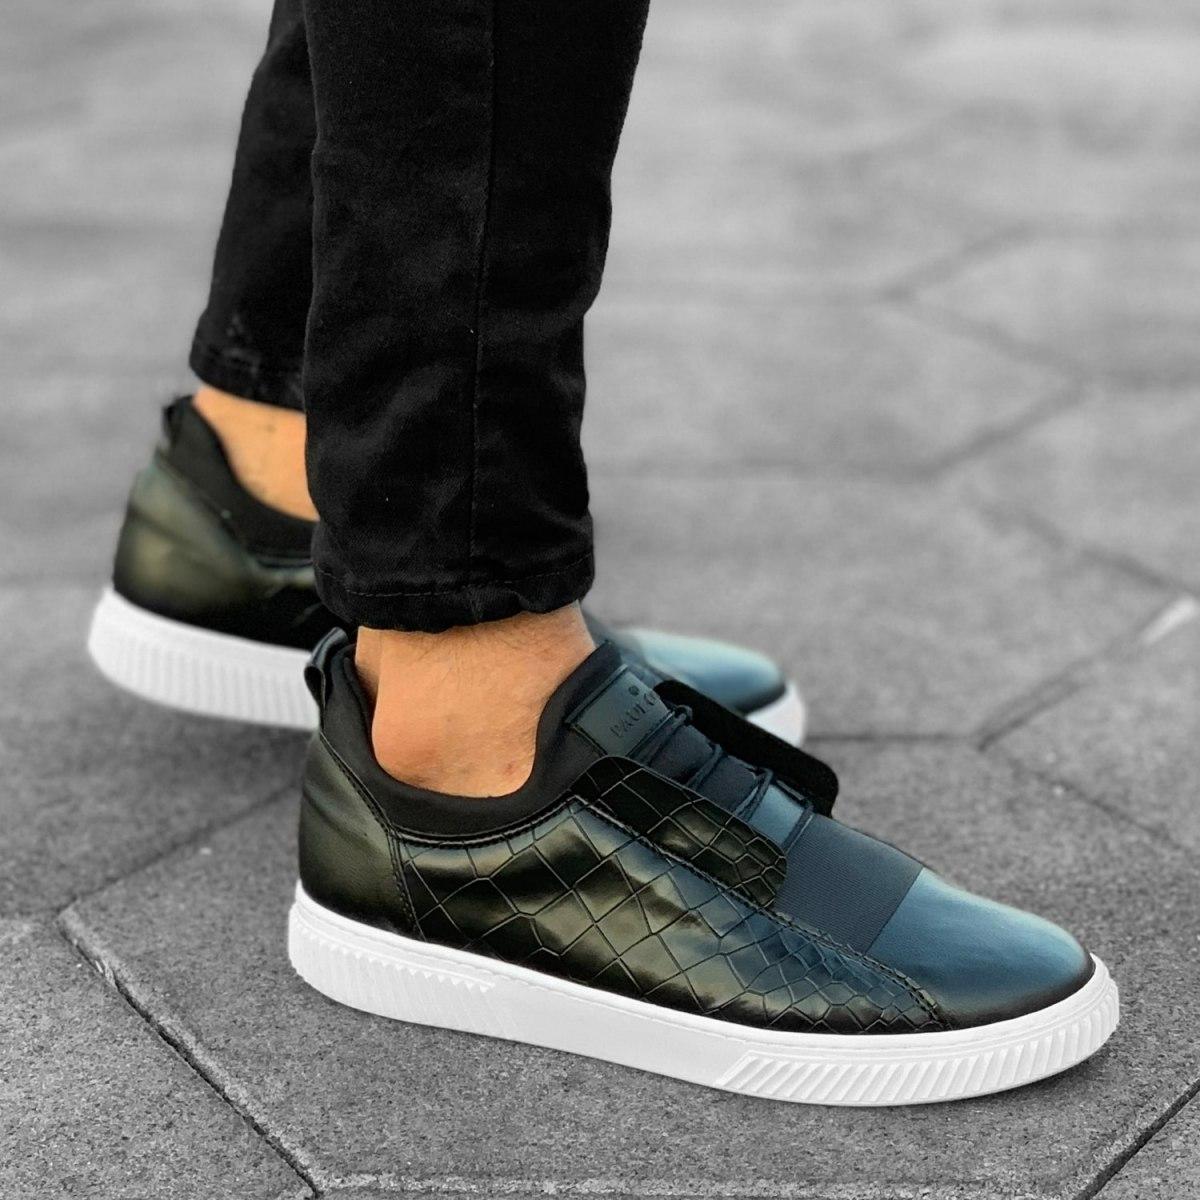 Croco Design Sneakers In Black Mv Premium Brand - 5